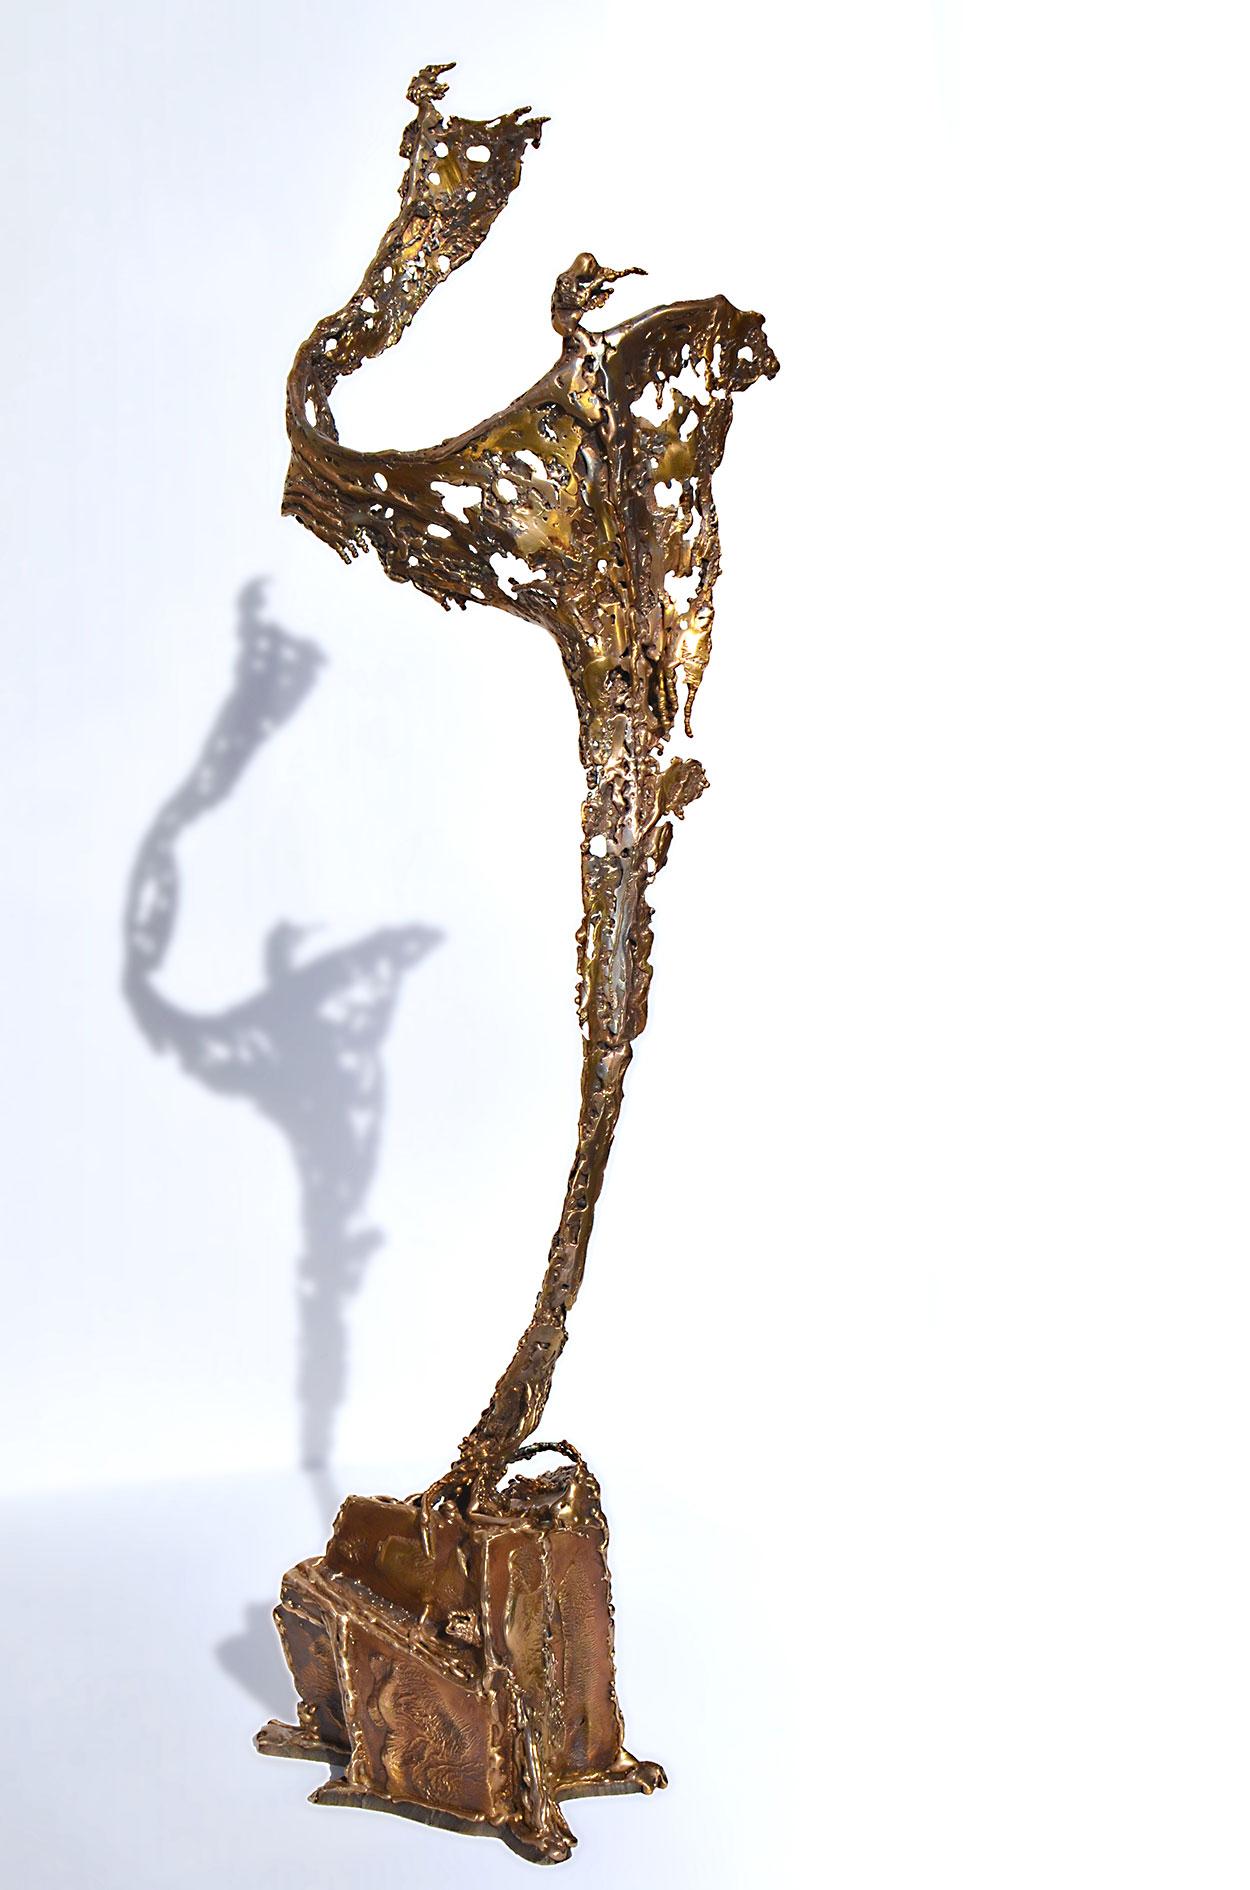 GAHR Metal Art